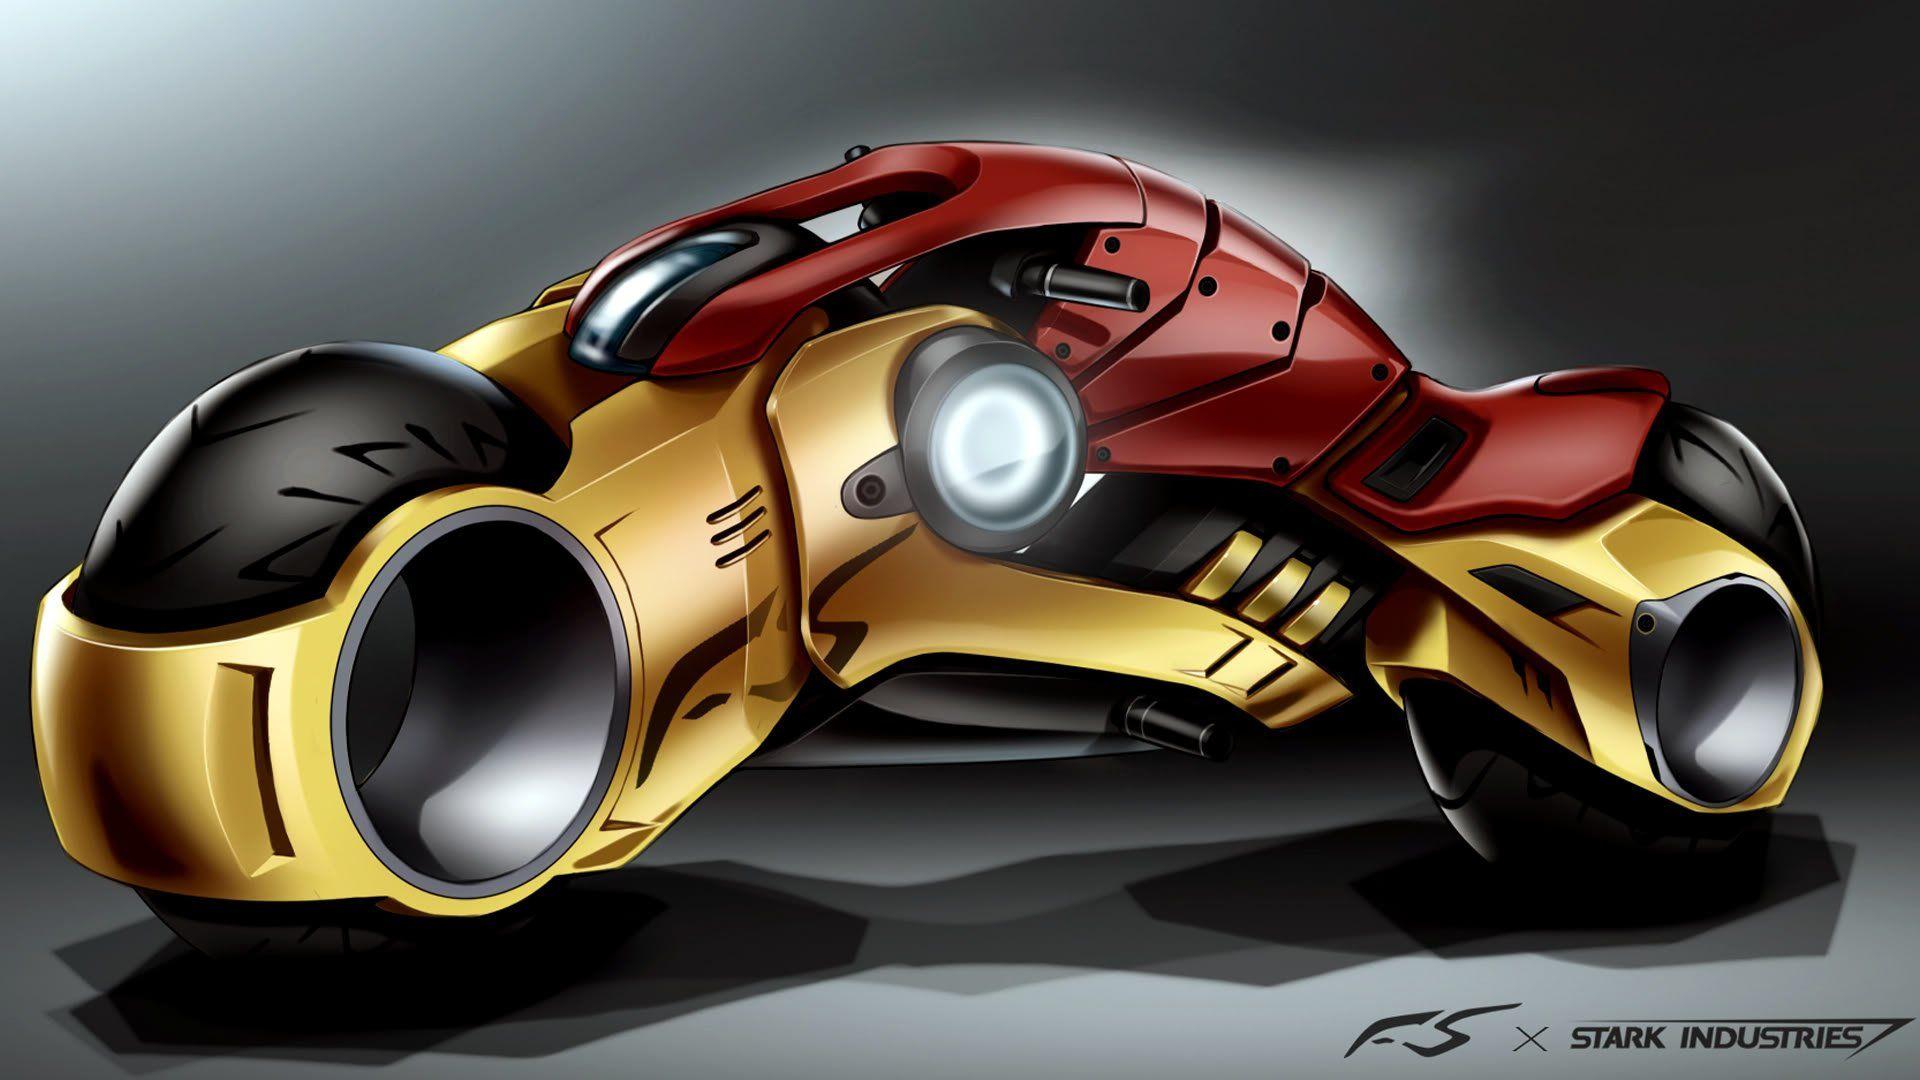 Pin By Amonli03 On Character Ideas Pinterest Iron Man Tron